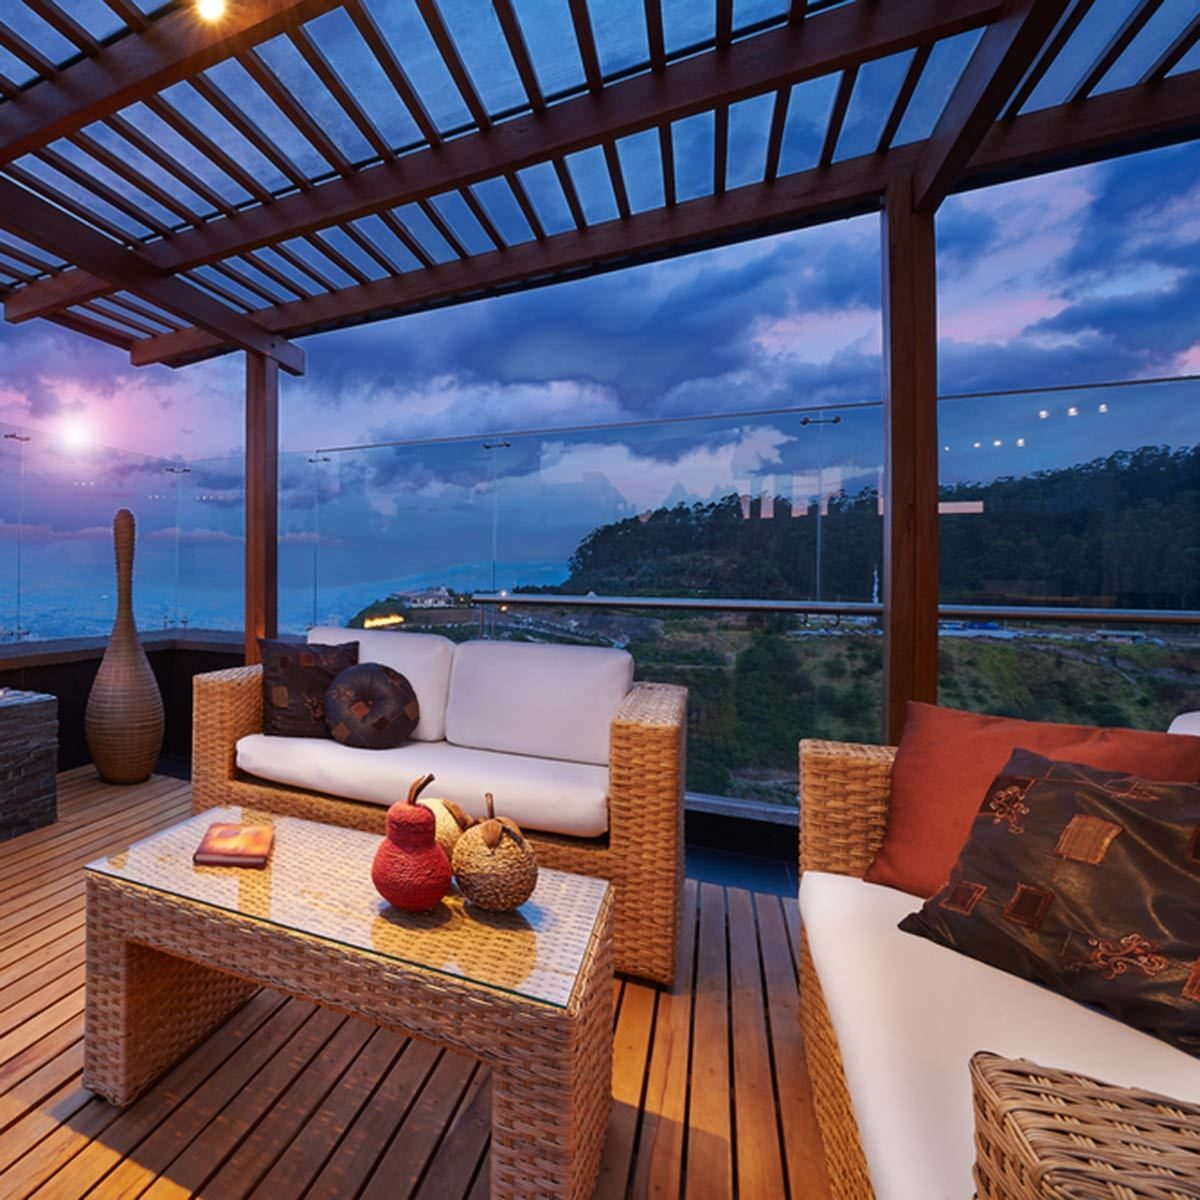 10 Amazing, Inspirational Decks | The Family Handyman on Deck Inspiration  id=16125